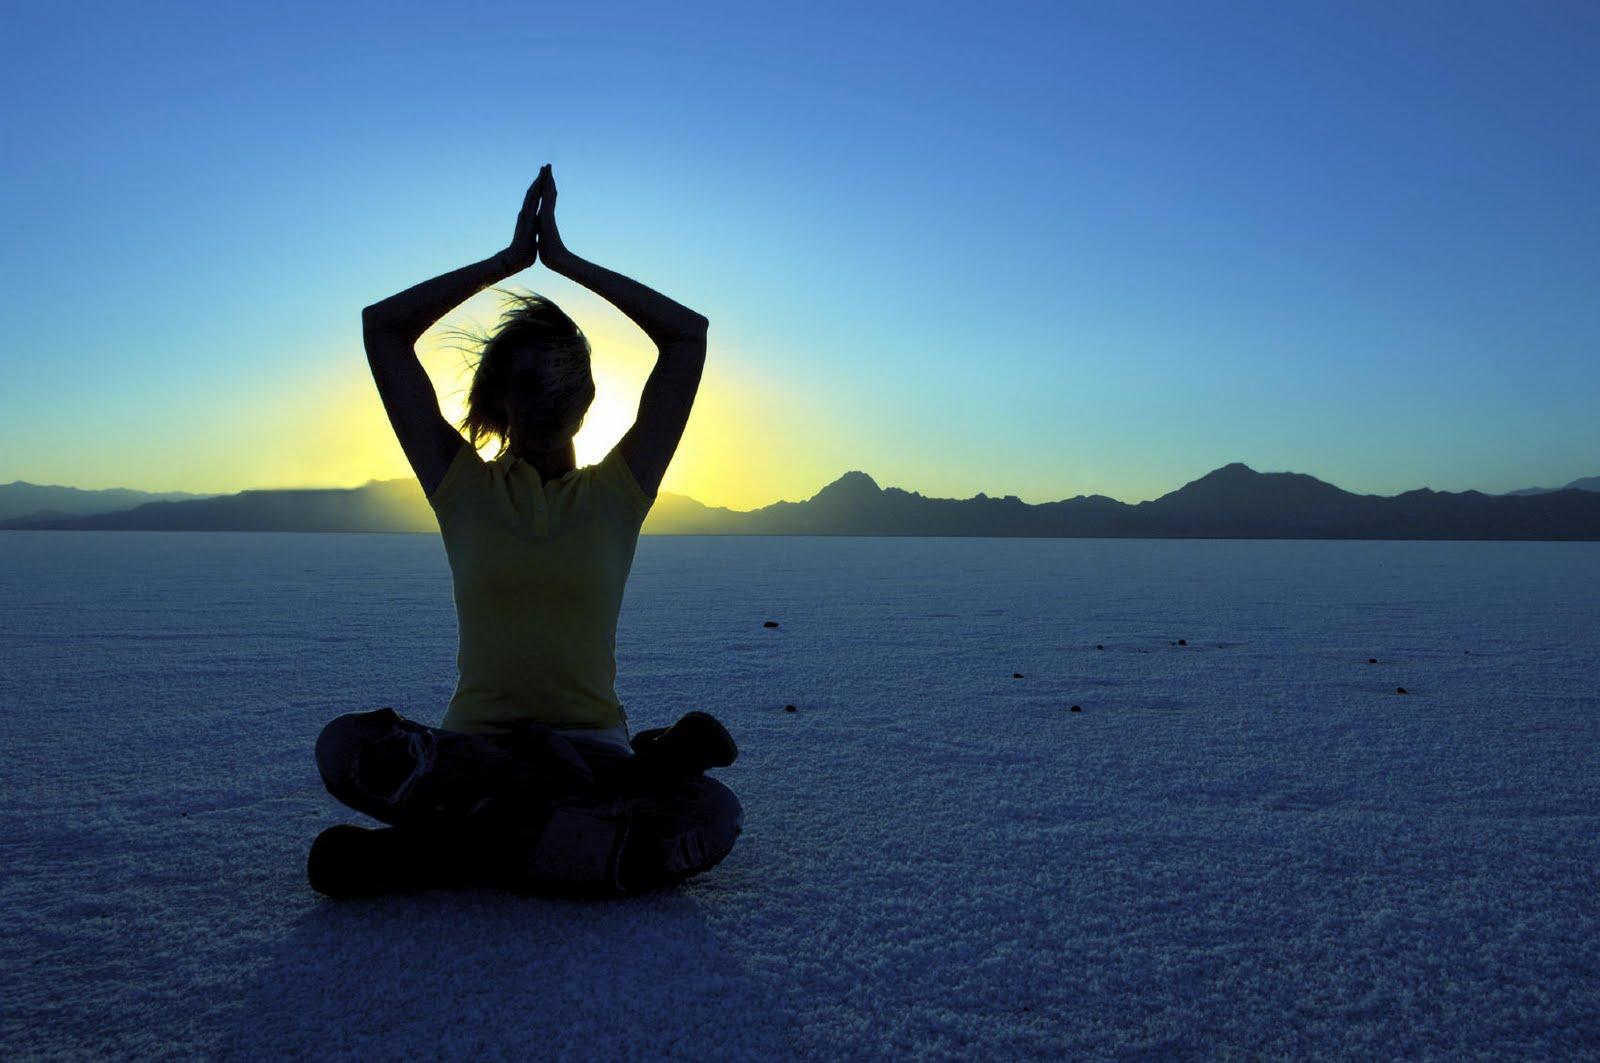 http://4.bp.blogspot.com/_f2tDRTSDQXg/TEaLN2UEX3I/AAAAAAAAANA/wlPmMtjDQzM/s1600/woman-in-meditation.jpg